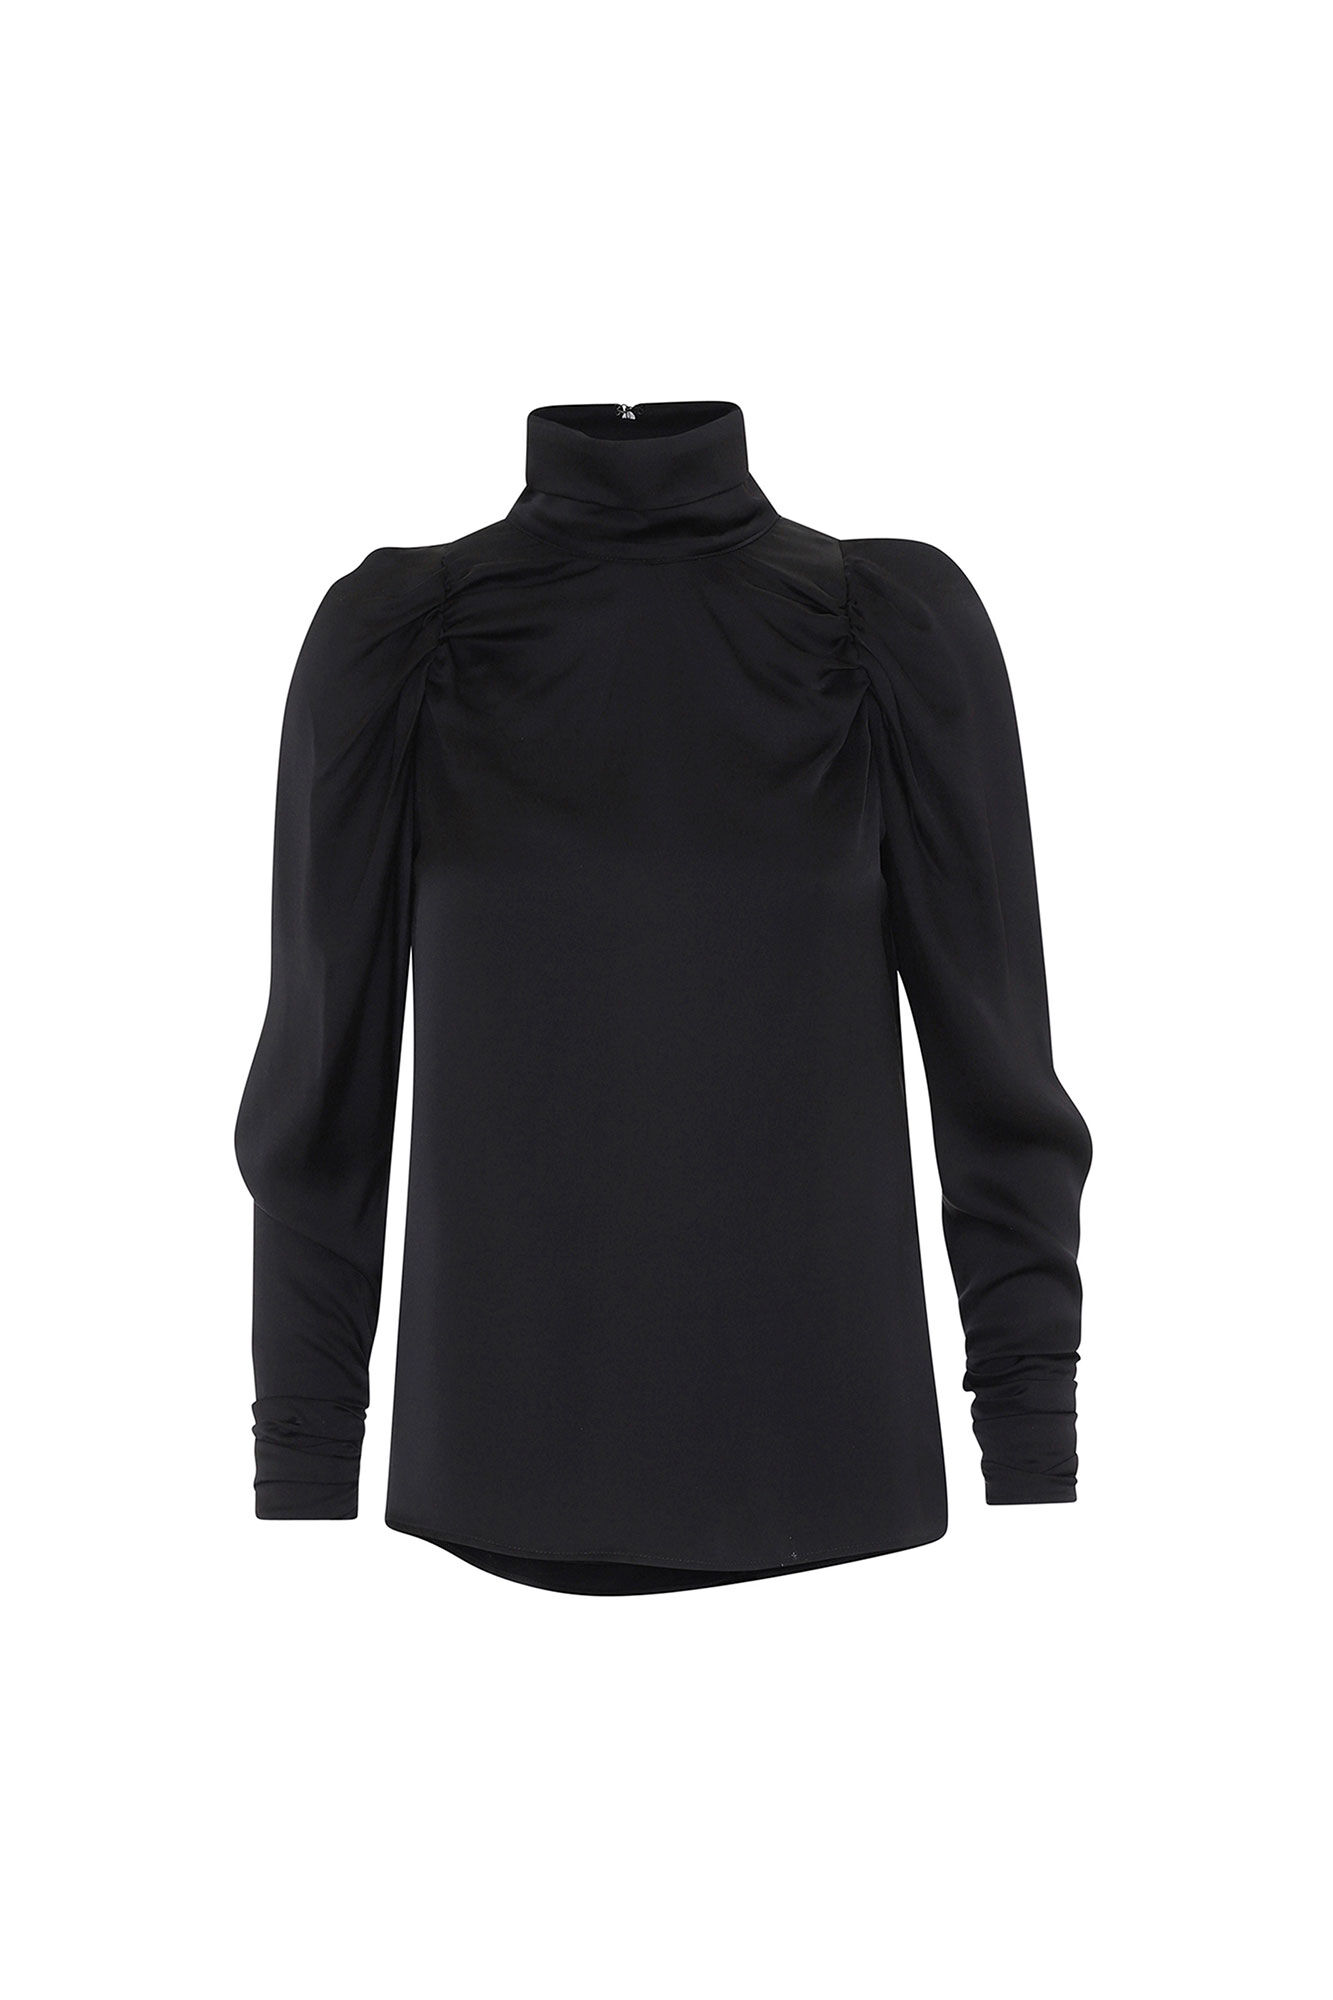 Nora blouse 3374370, BLACK